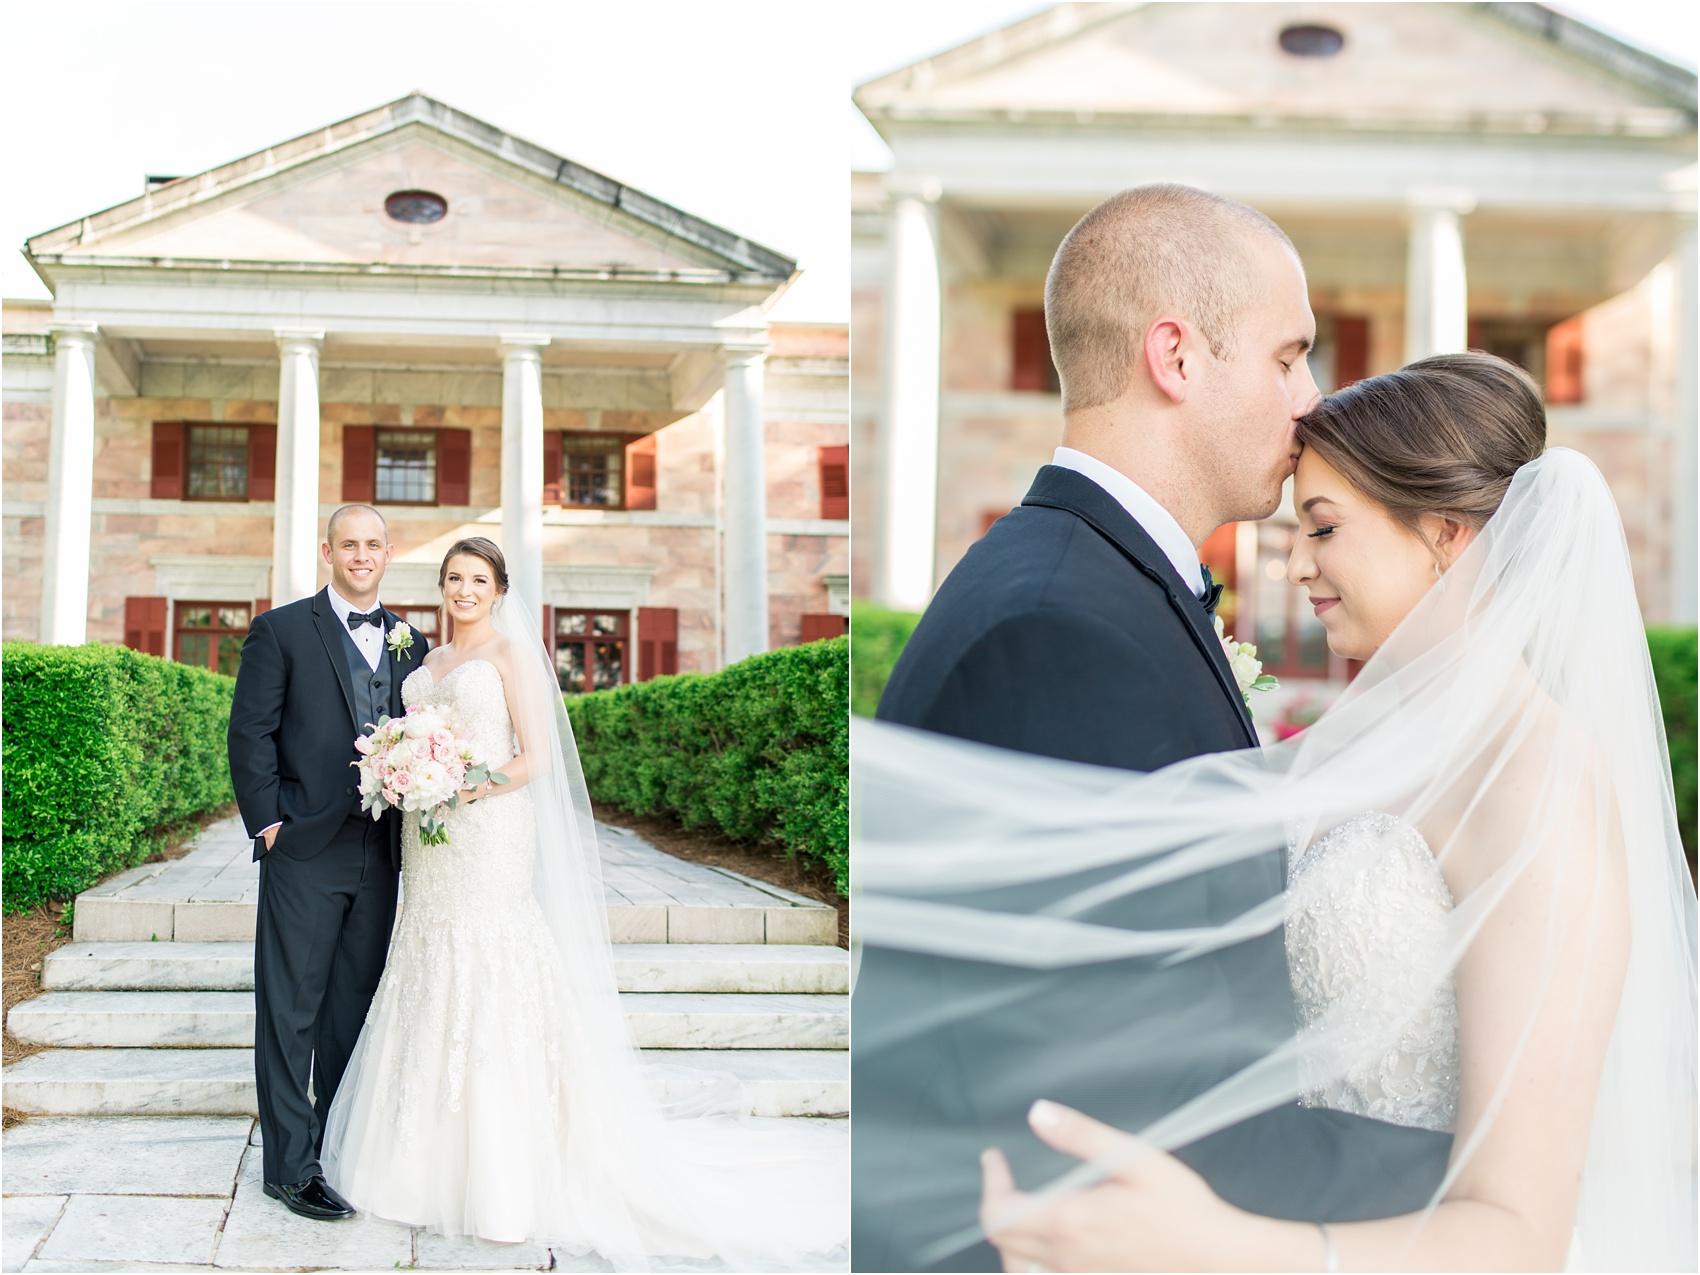 Savannah Eve Photography- Nutt Wedding- Blog-93.jpg